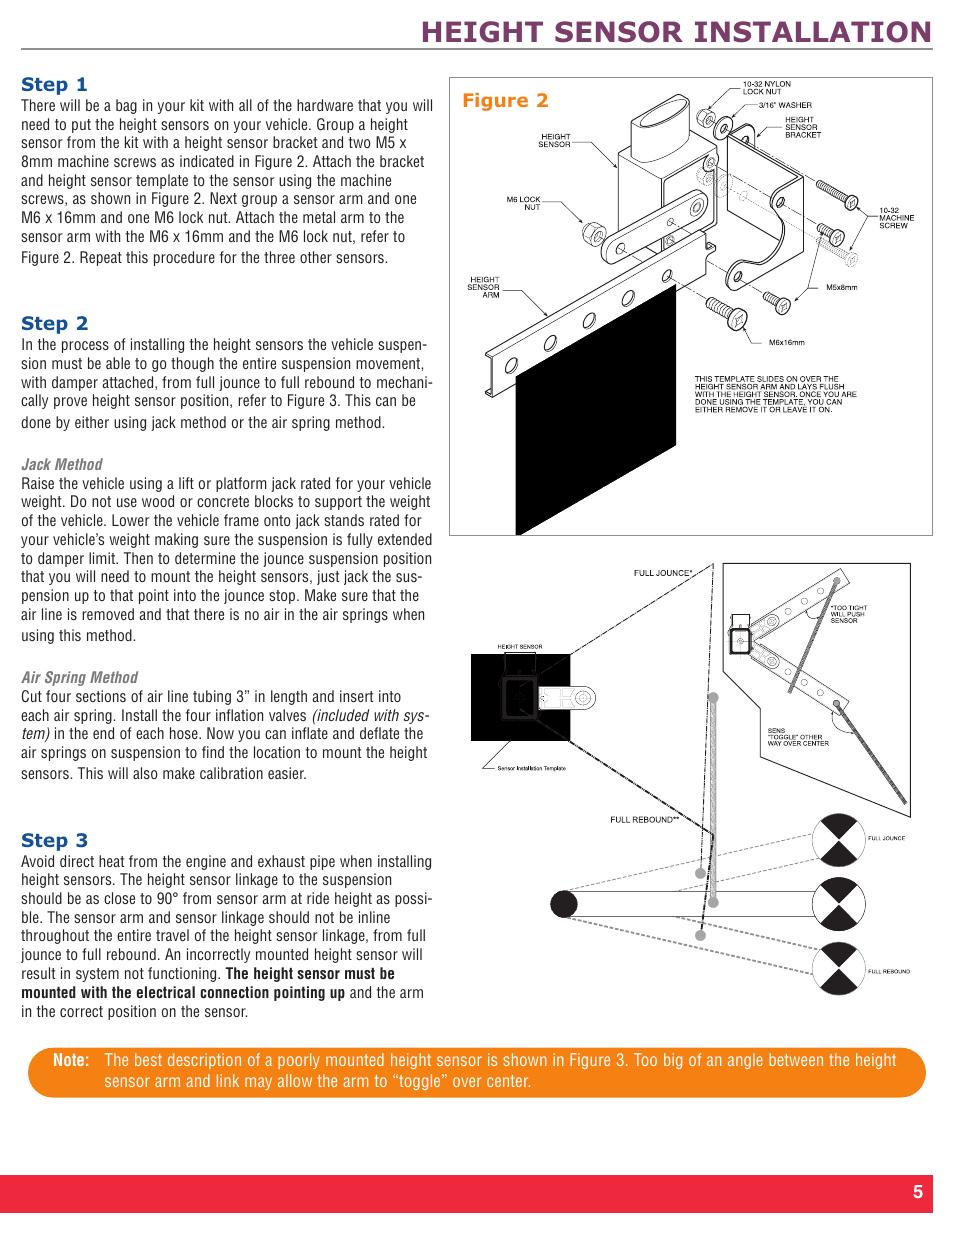 medium resolution of height sensor installation firestone intelli ride 2230 user manual page 9 20